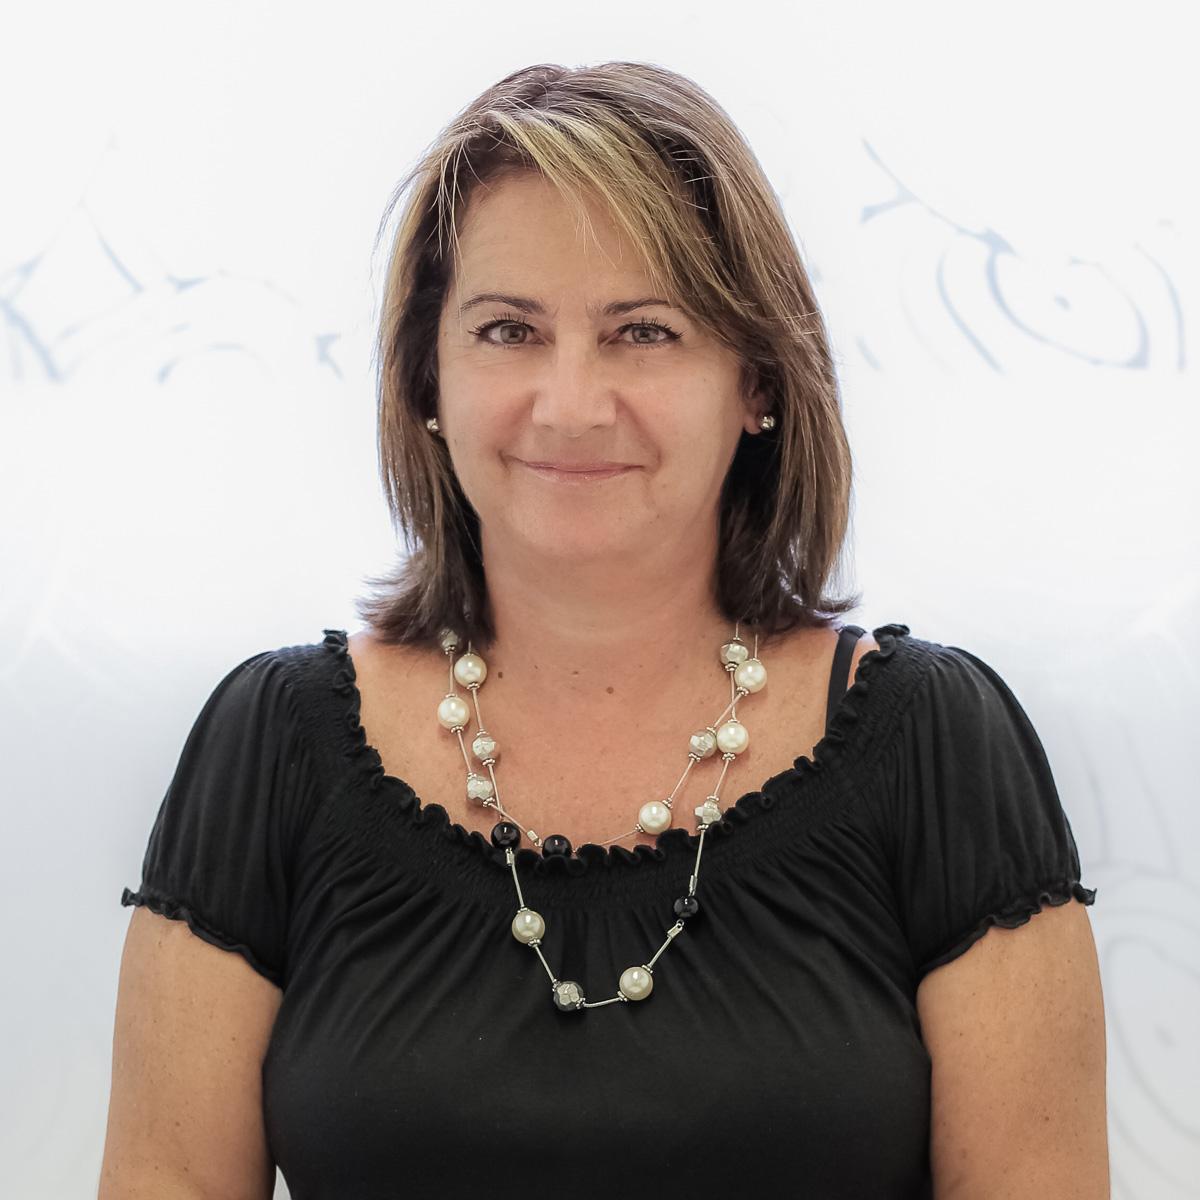 Paola Colombini